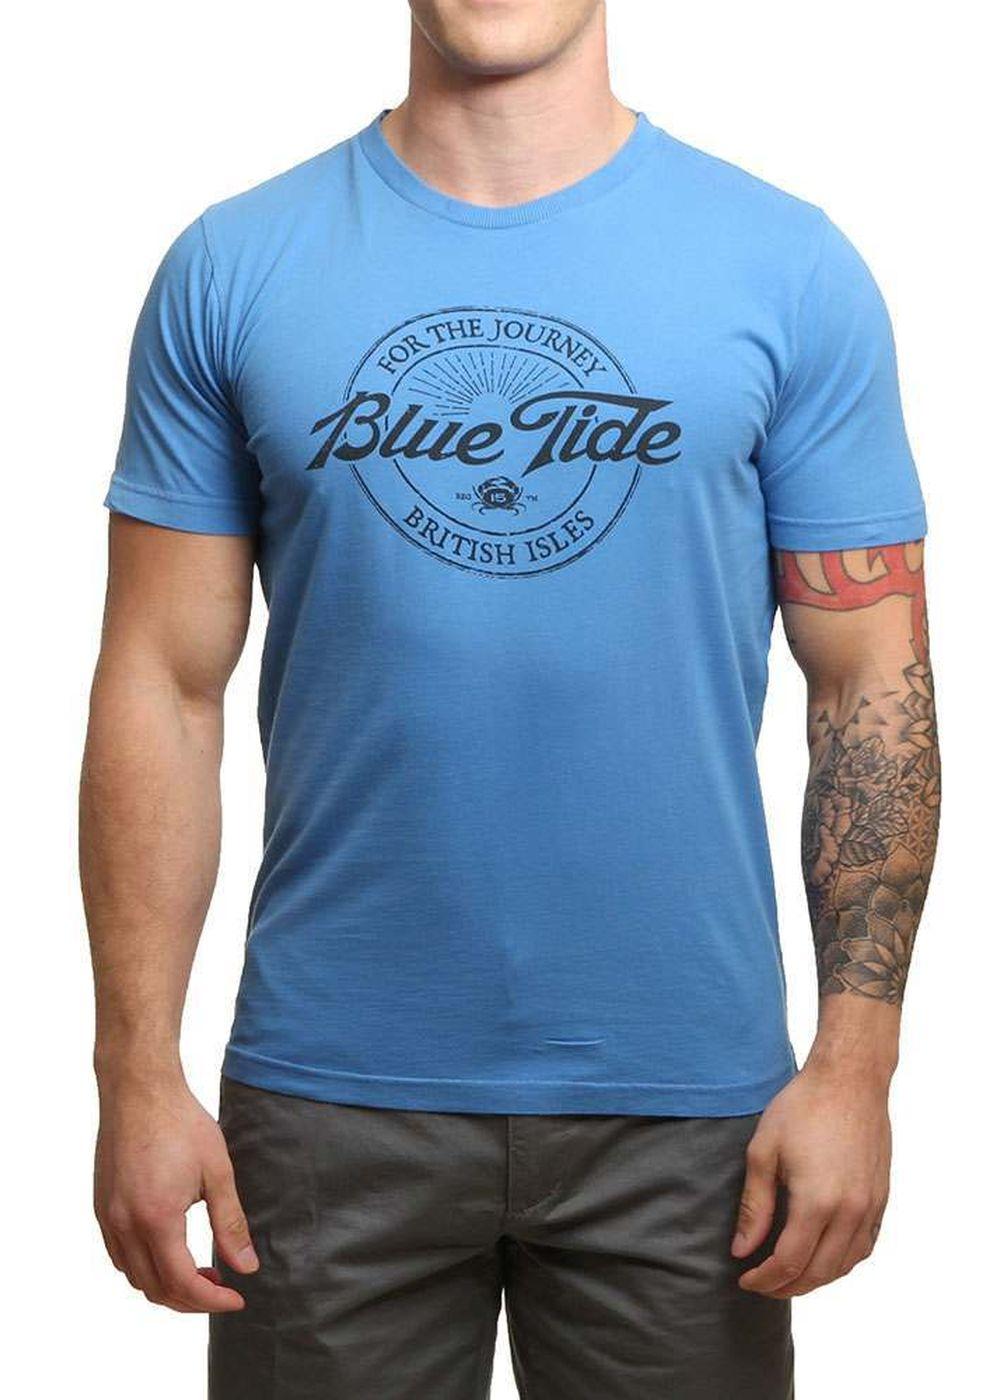 blue-tide-for-the-journey-tee-regatta